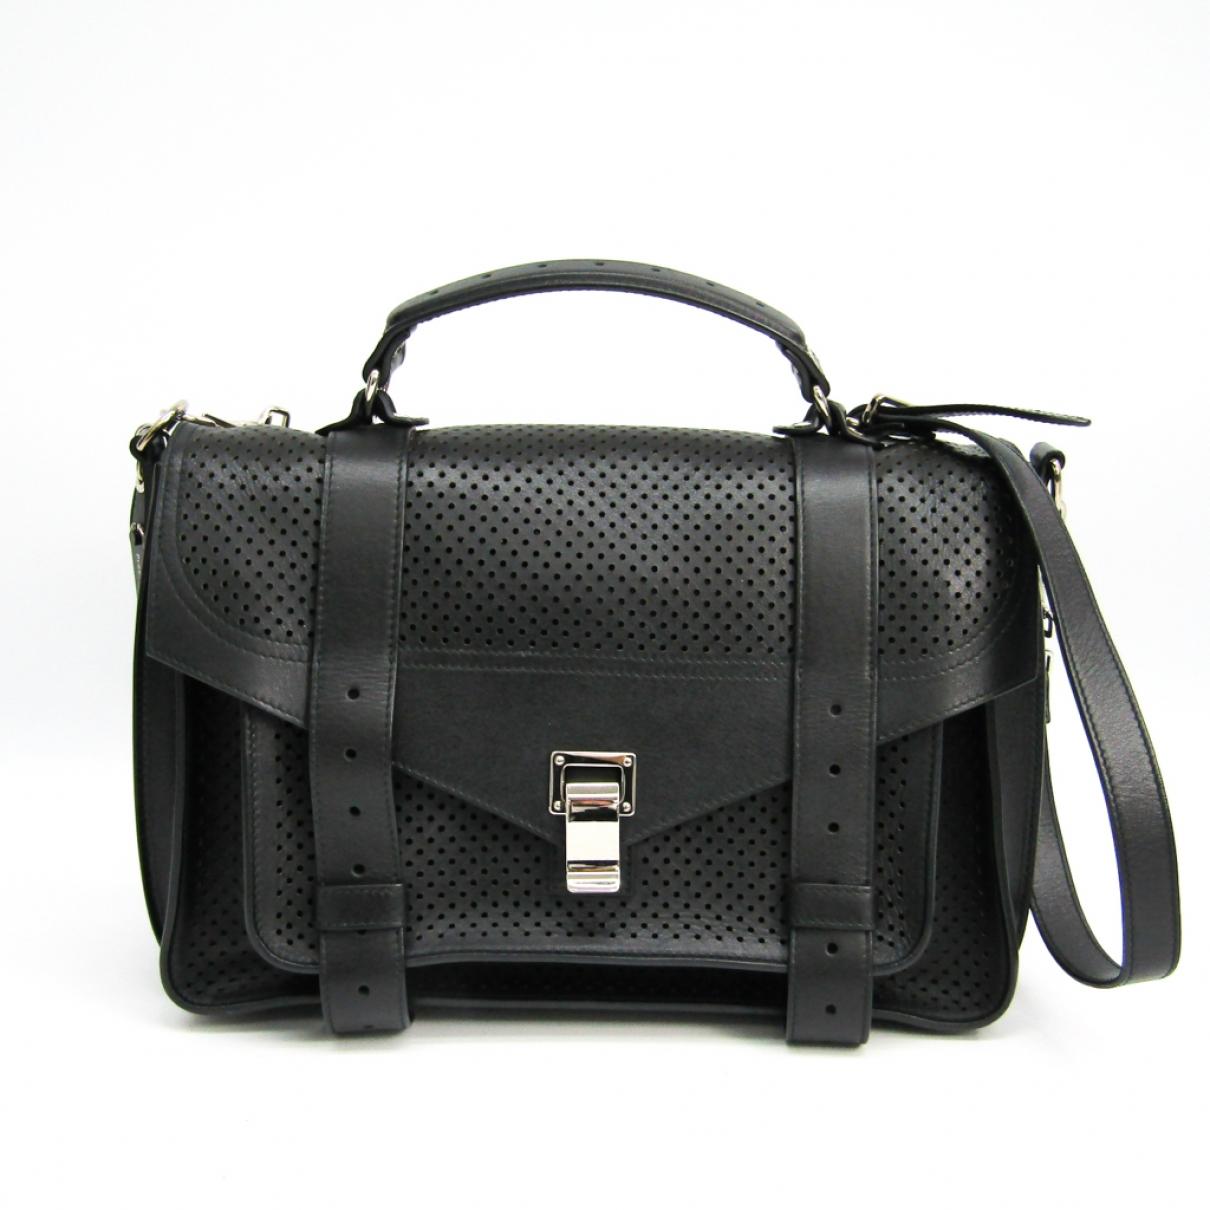 Proenza Schouler \N Black Leather handbag for Women \N